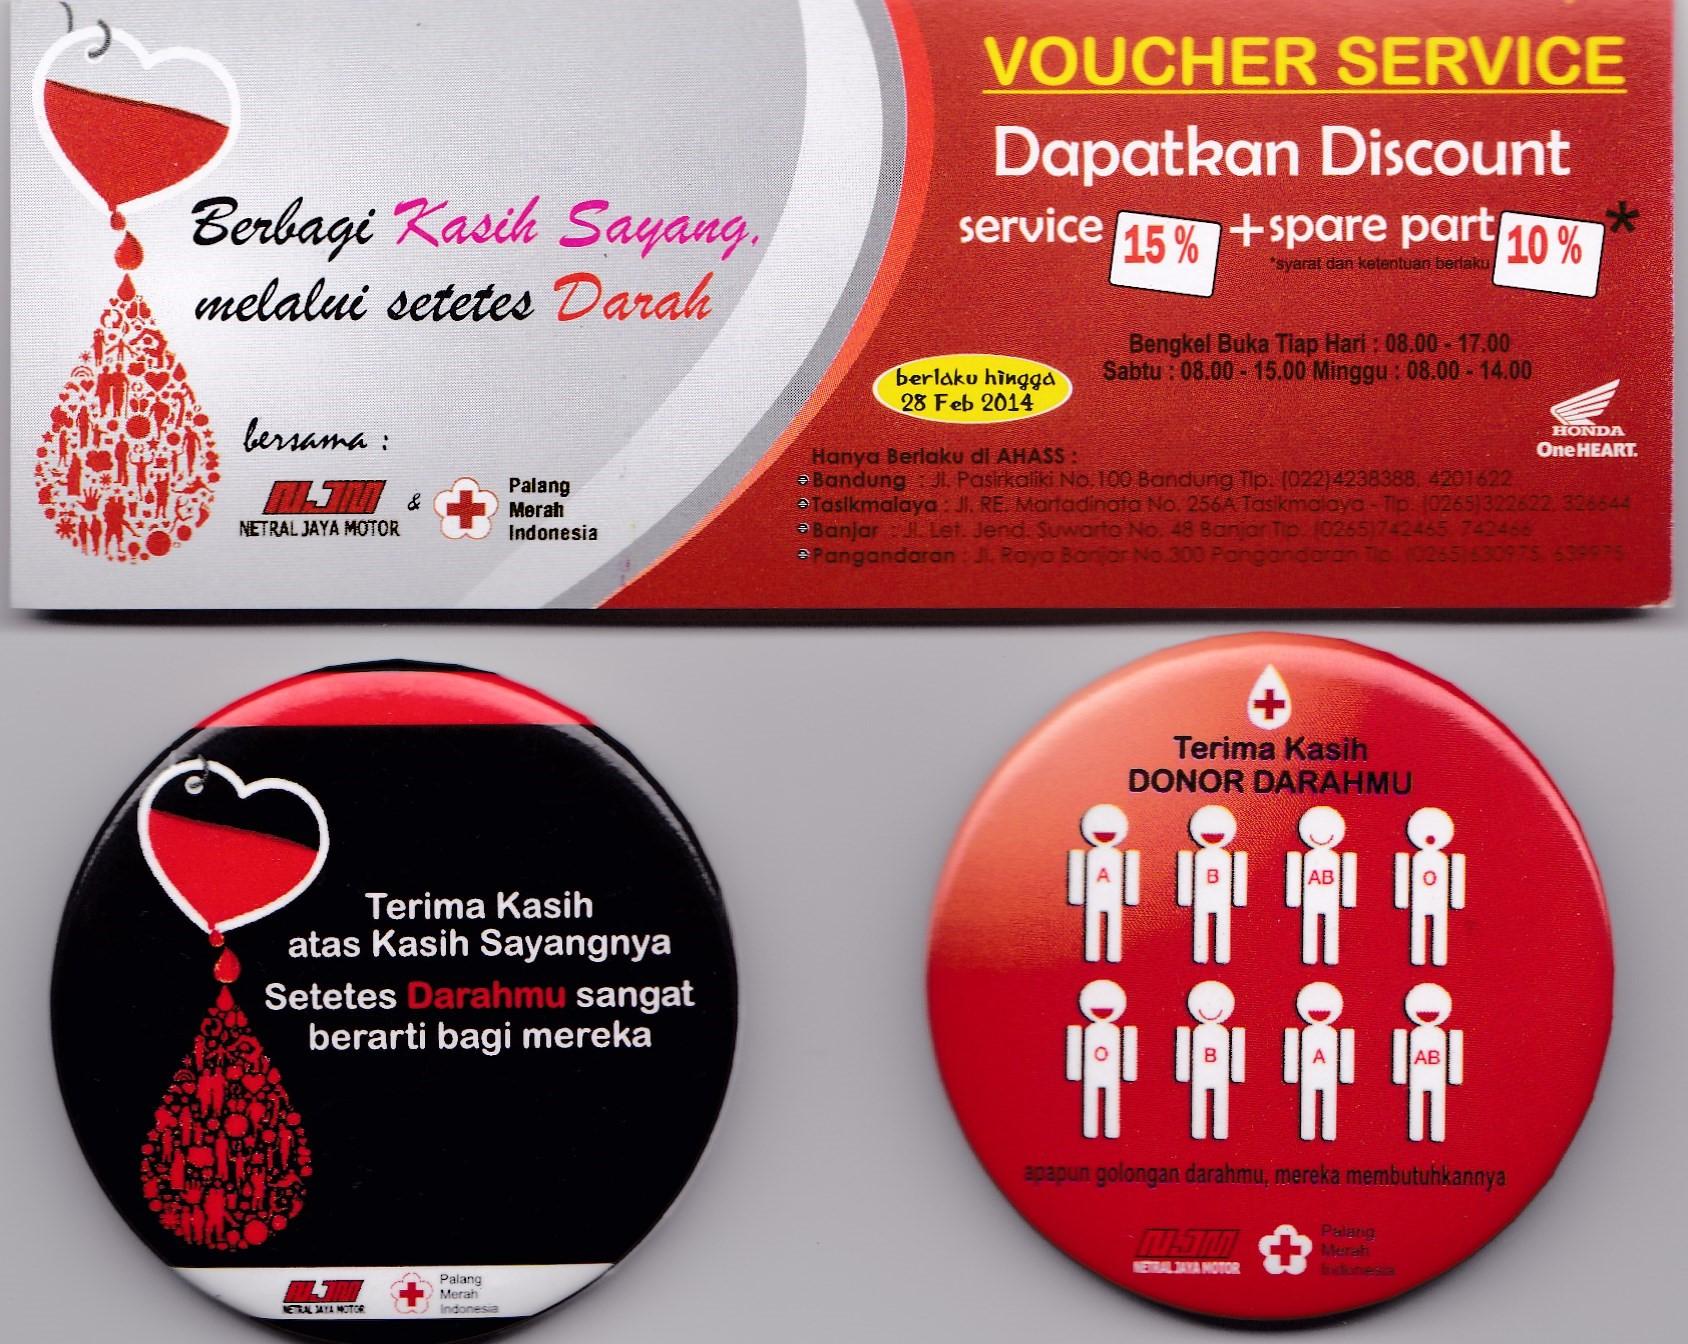 Netral Jaya Motor Pangandaran Akan Gelar Donor Darah